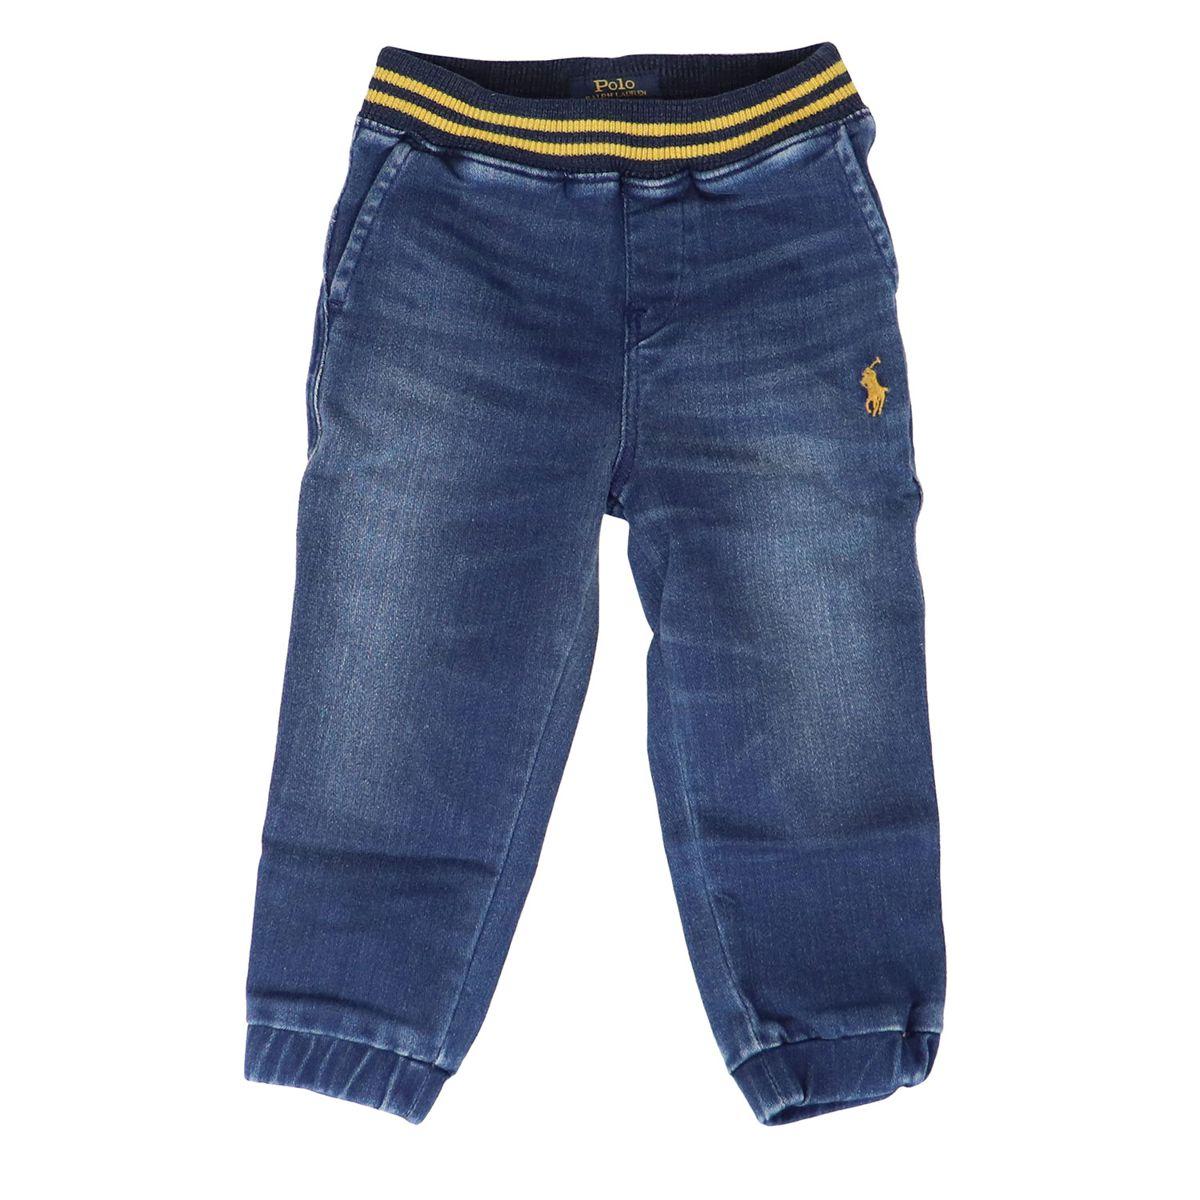 Welt pocket jeans with elastic waist and cuffs at the bottom Dark denim Polo Ralph Lauren